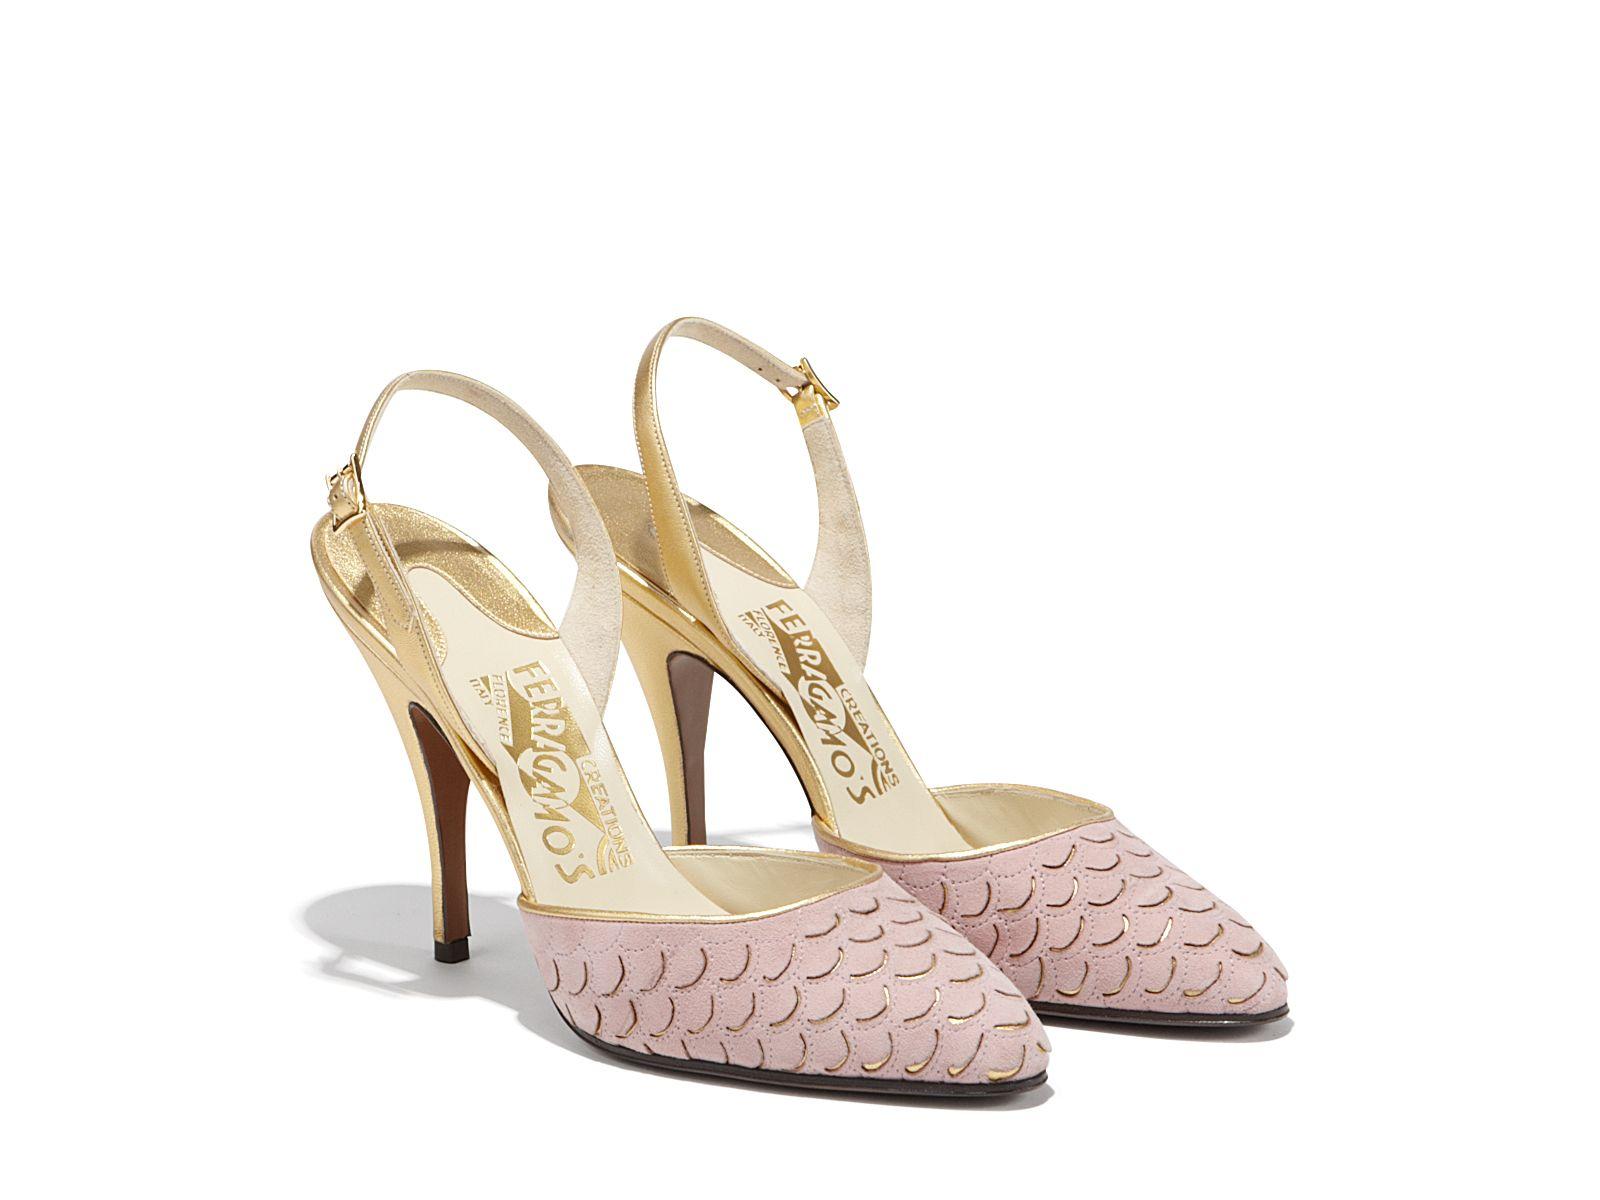 Salvatore Ferragamo Creations Pointed-Toe Pumps discounts online sbxfZURGNg